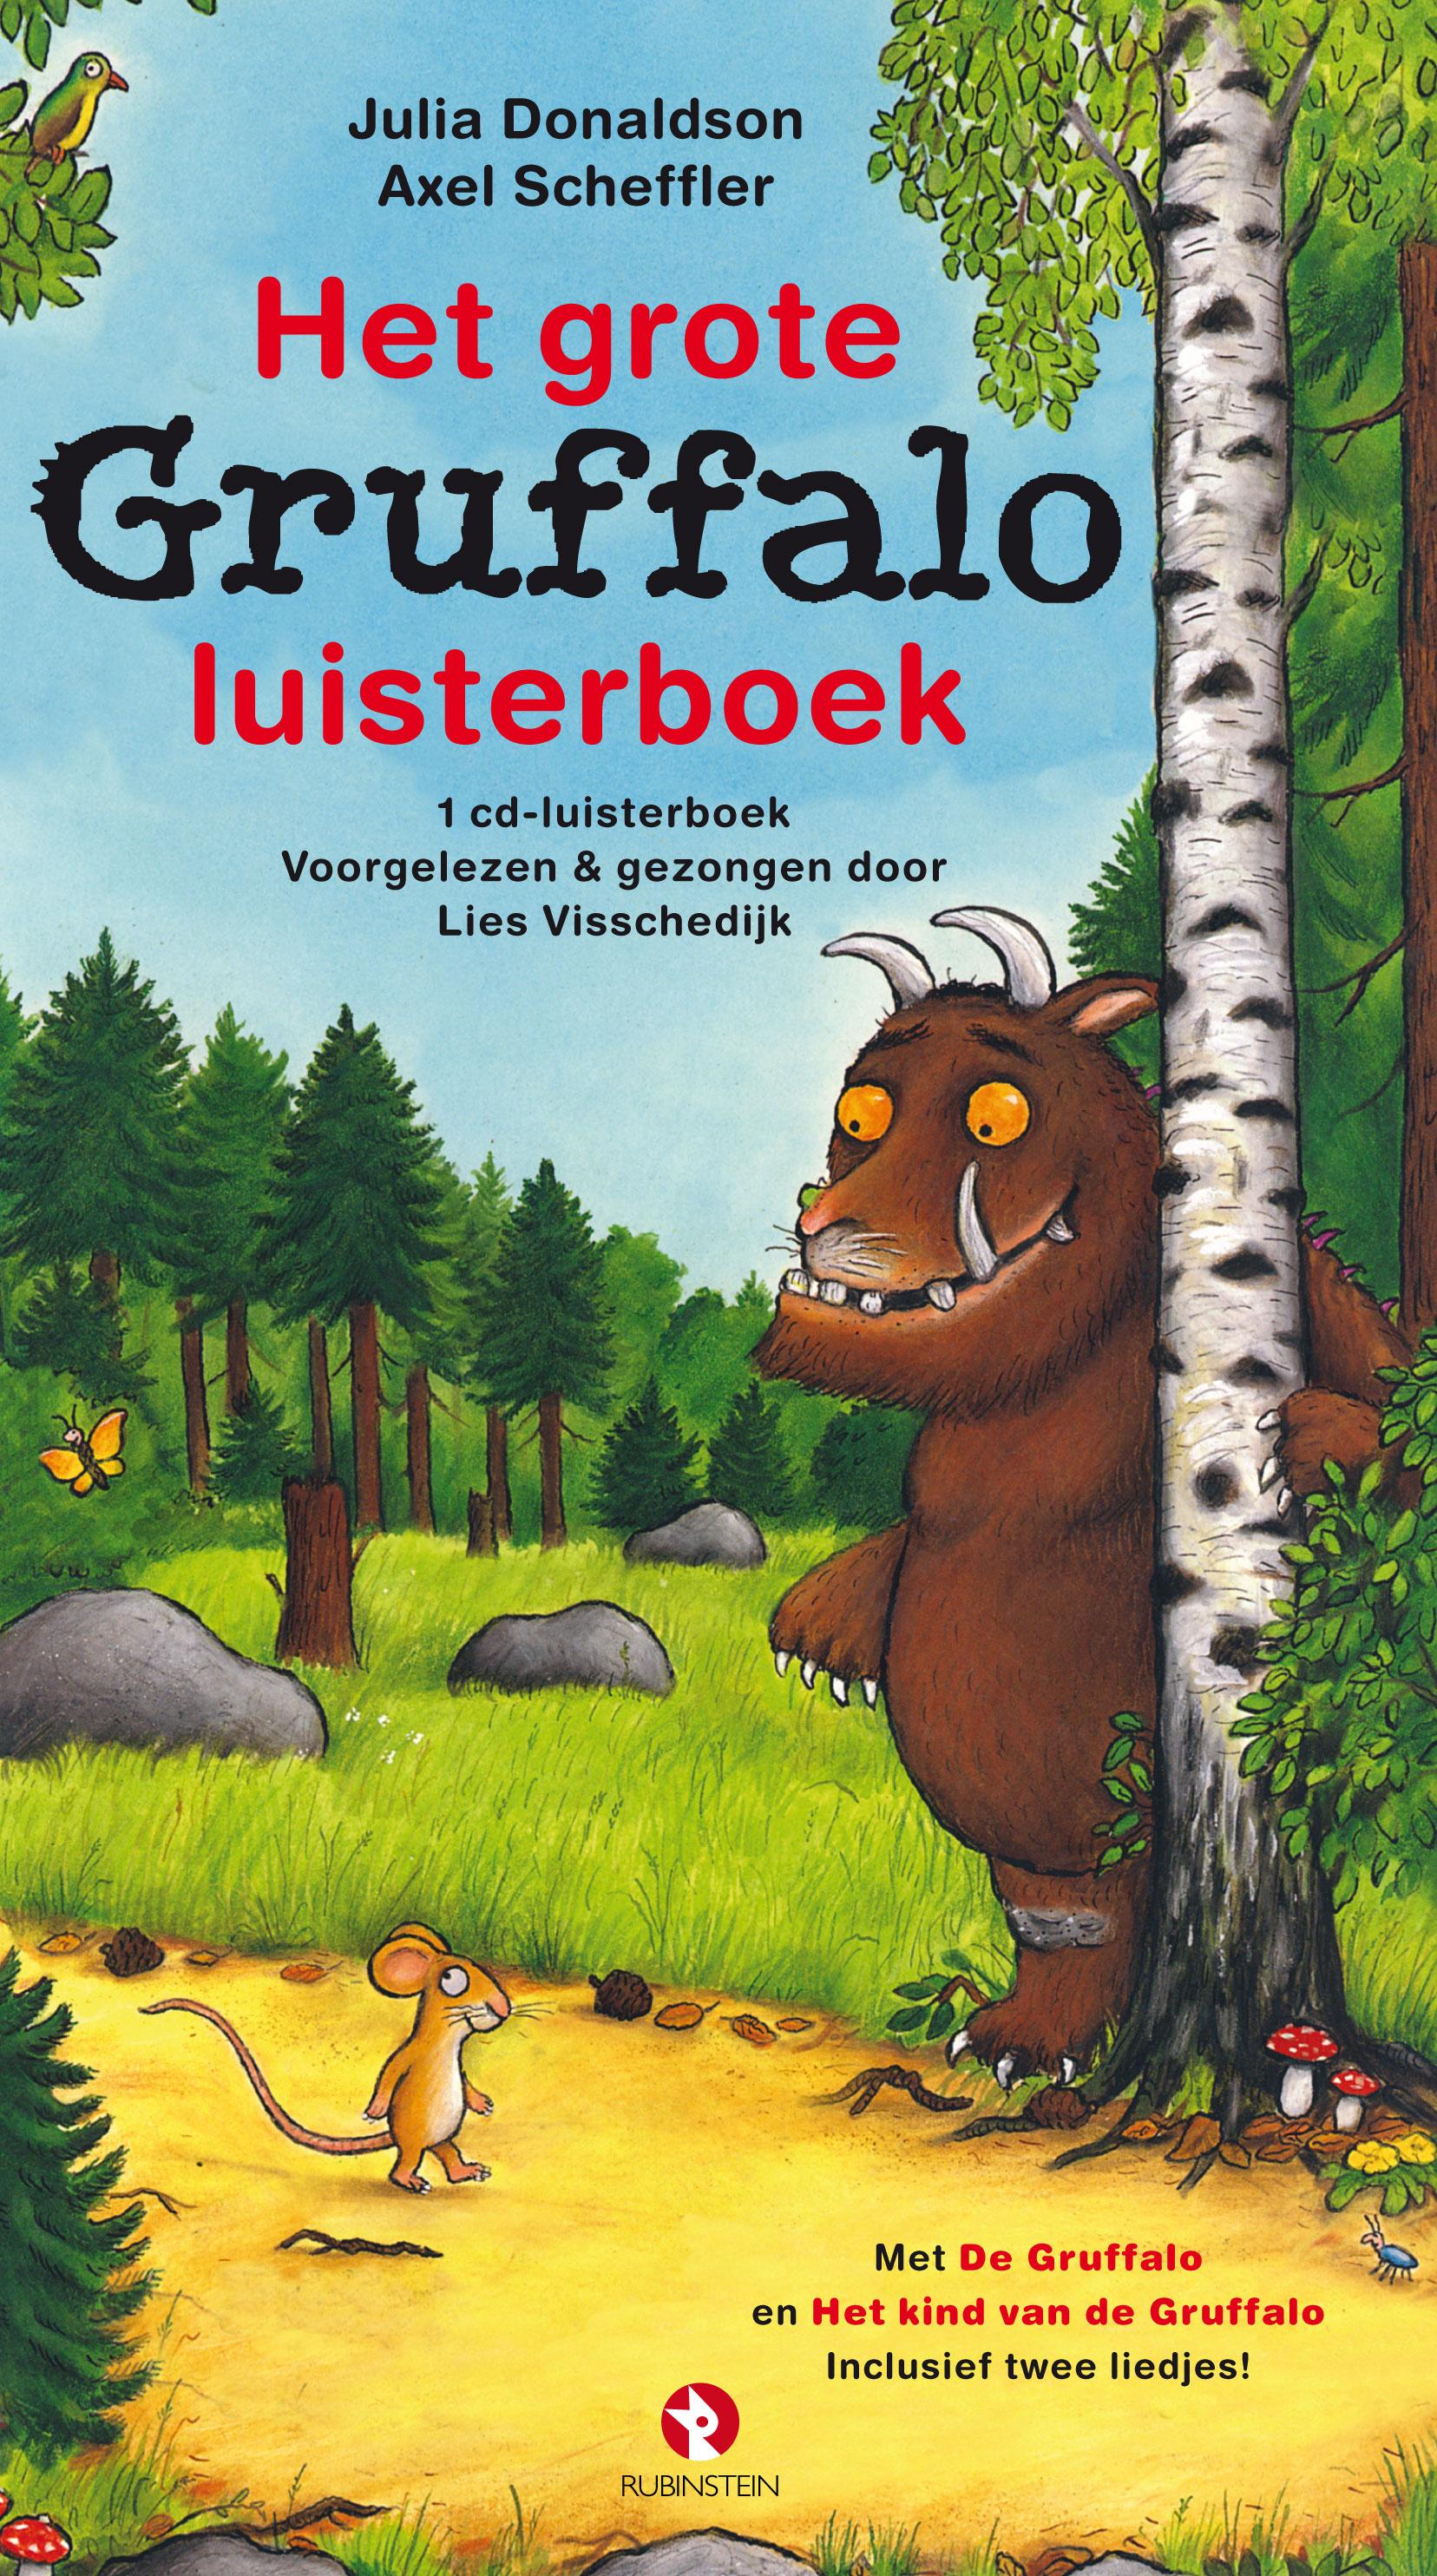 Grote Gruffalo luisterboek, het Book Cover